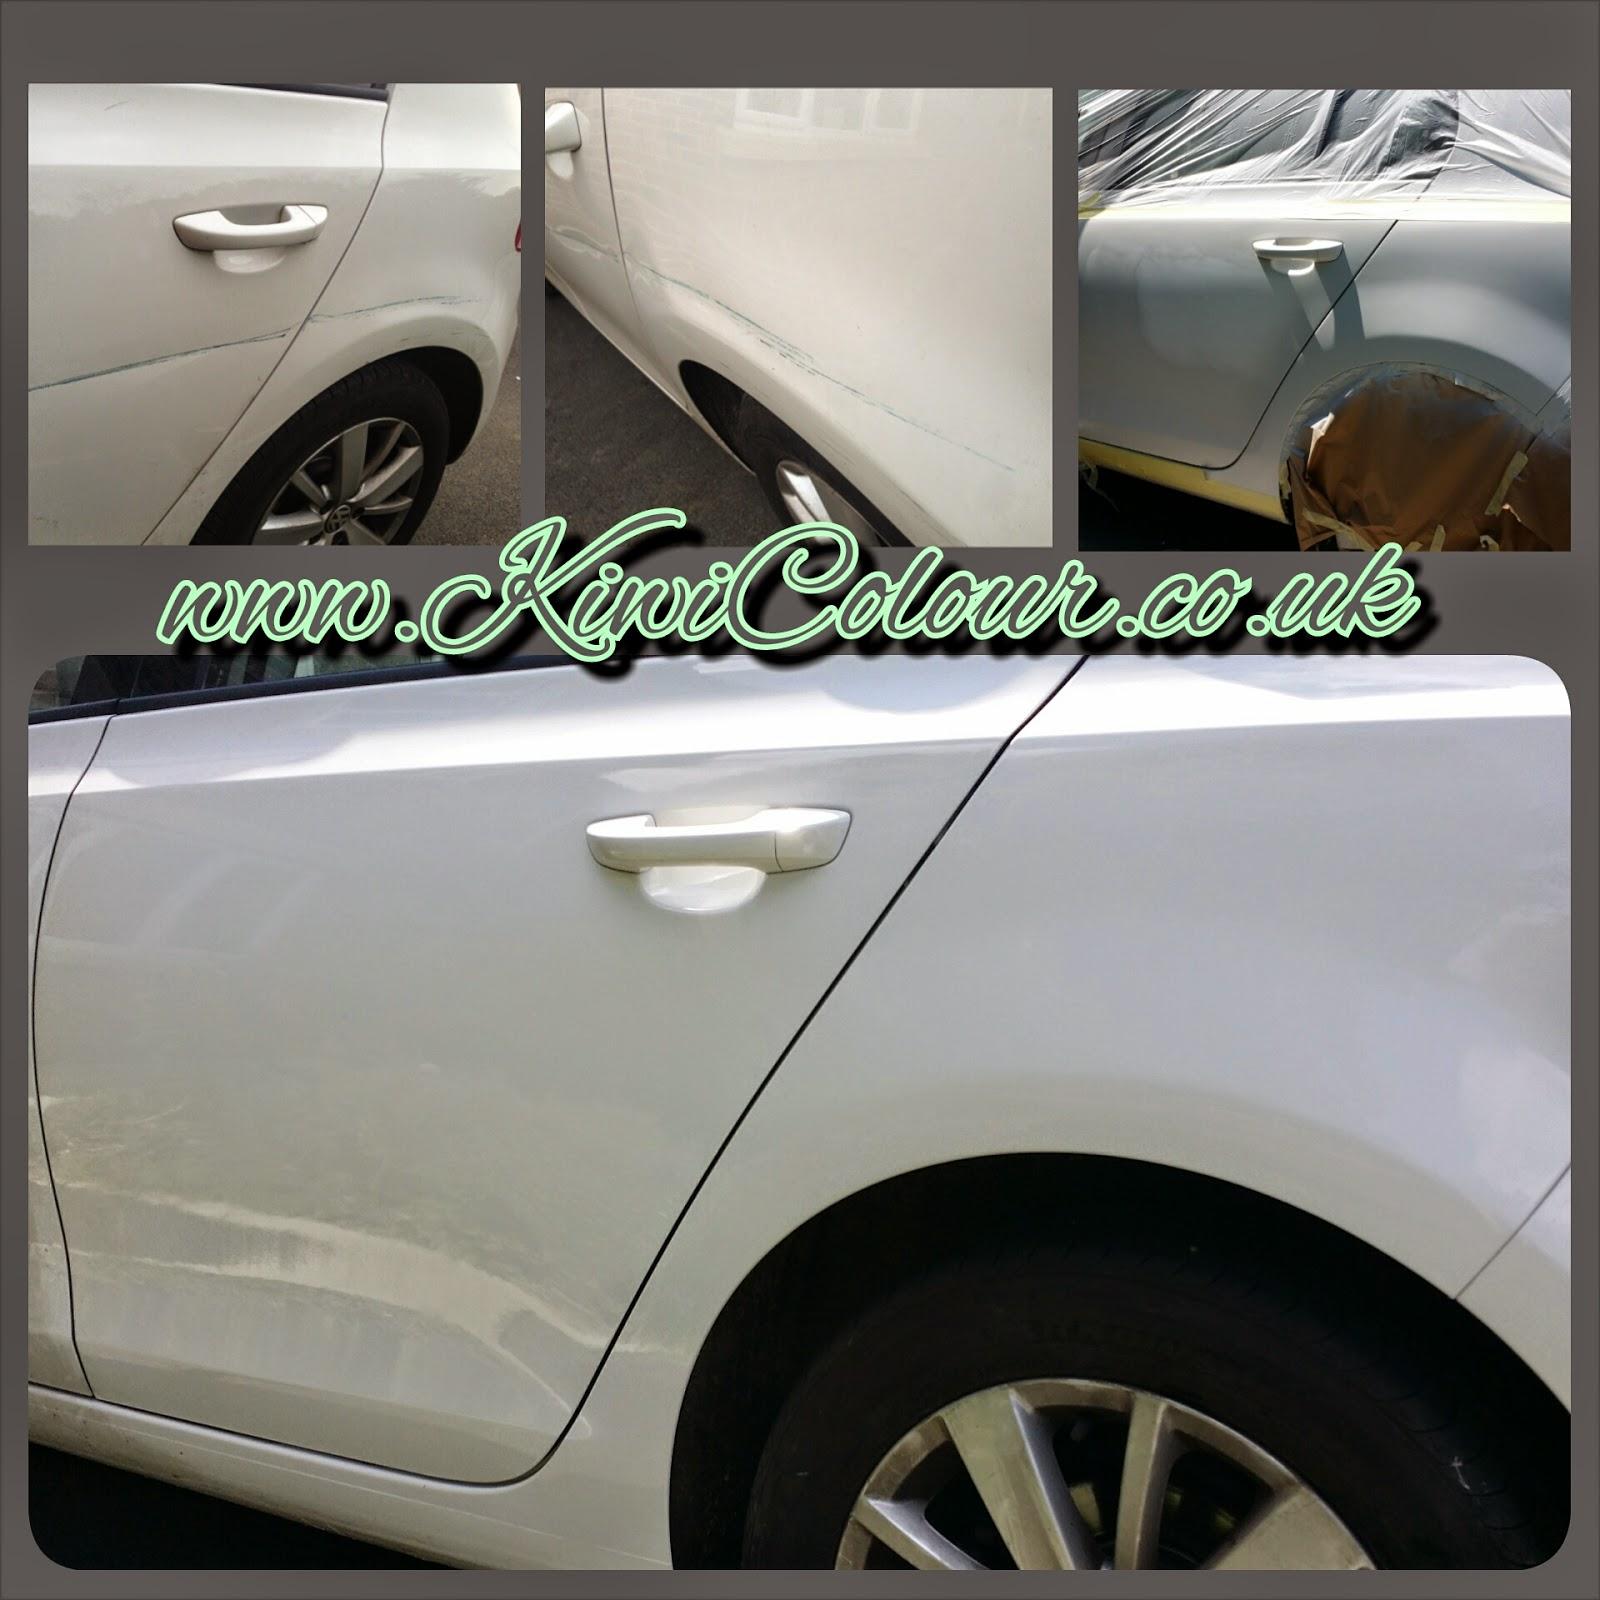 Mobile Car Scratch Dent Repair Leeds: Leeds bodyshop spray paint